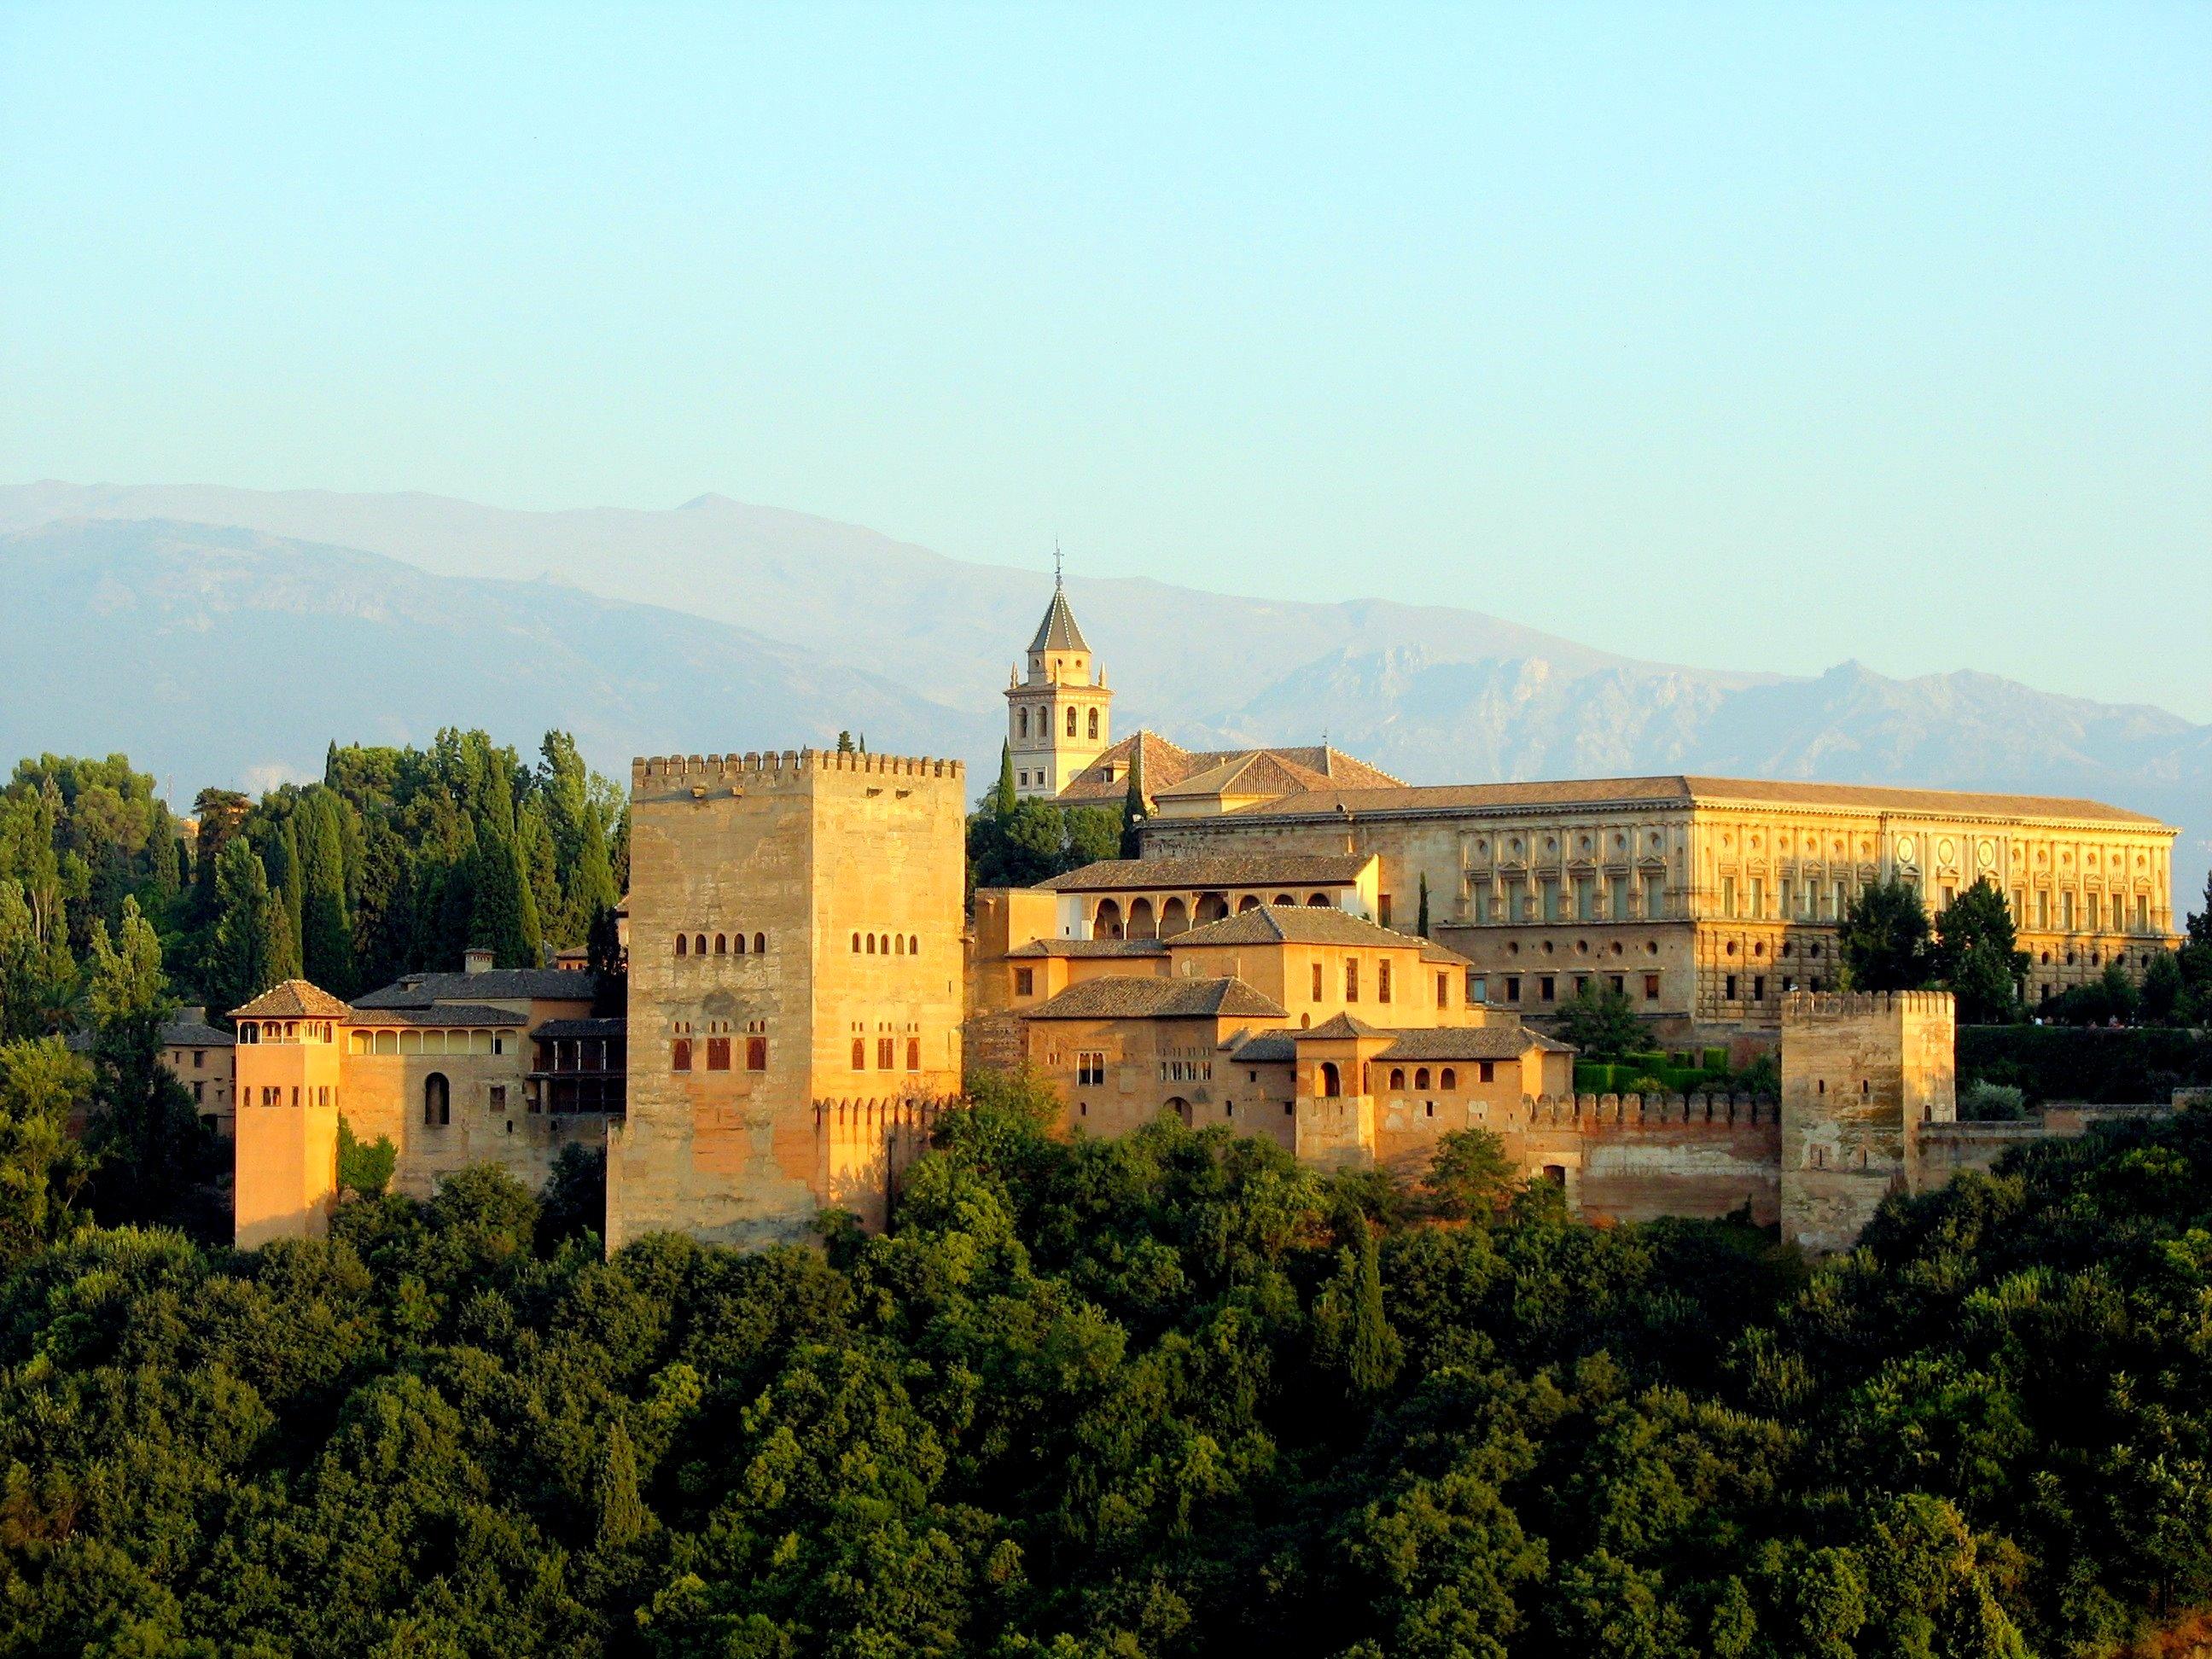 La Alhambra de Granada, Andalucía.